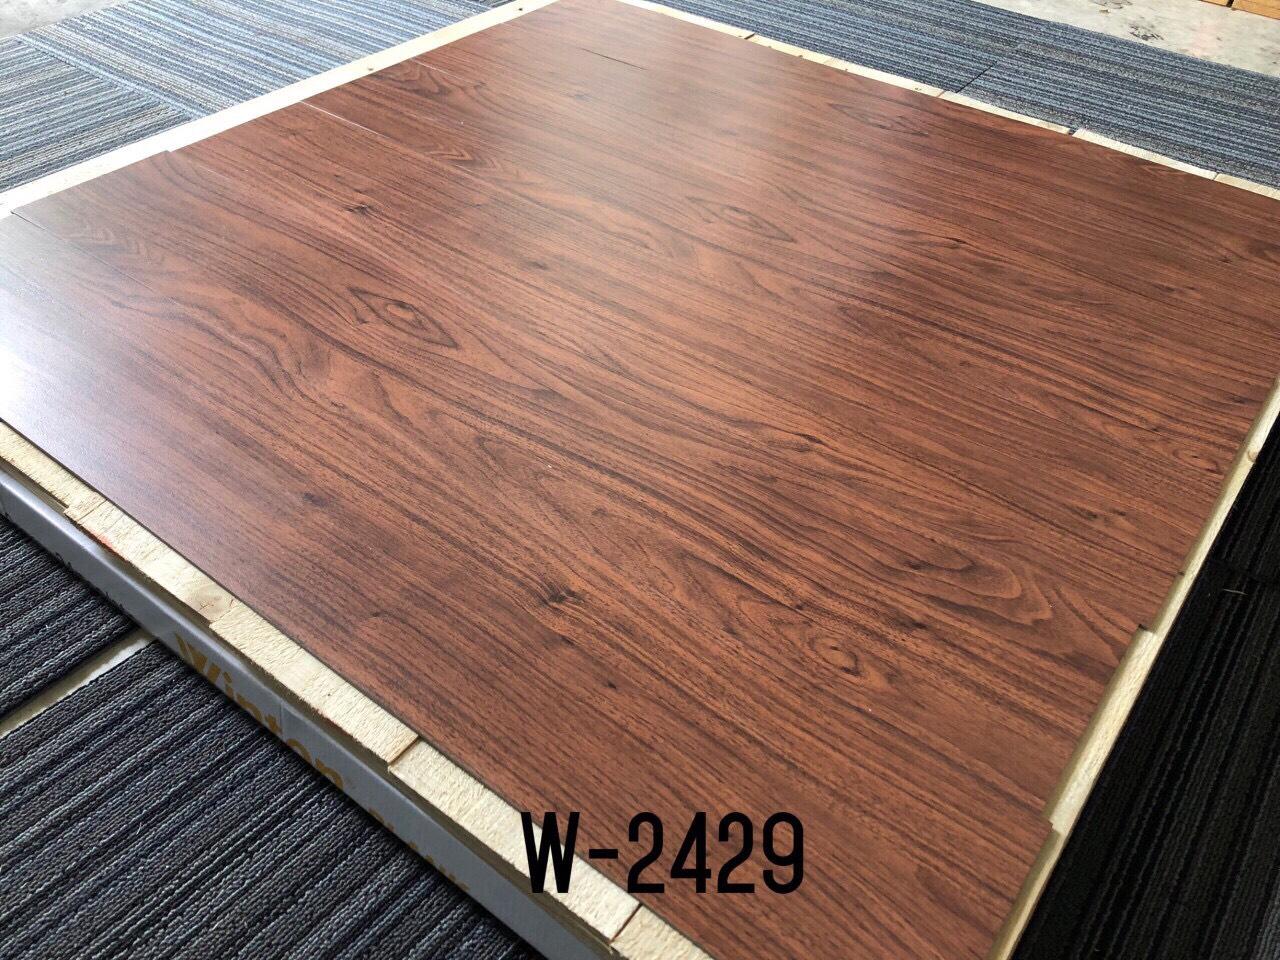 Sàn nhựa vân gỗ Nanolife 3mm W2429